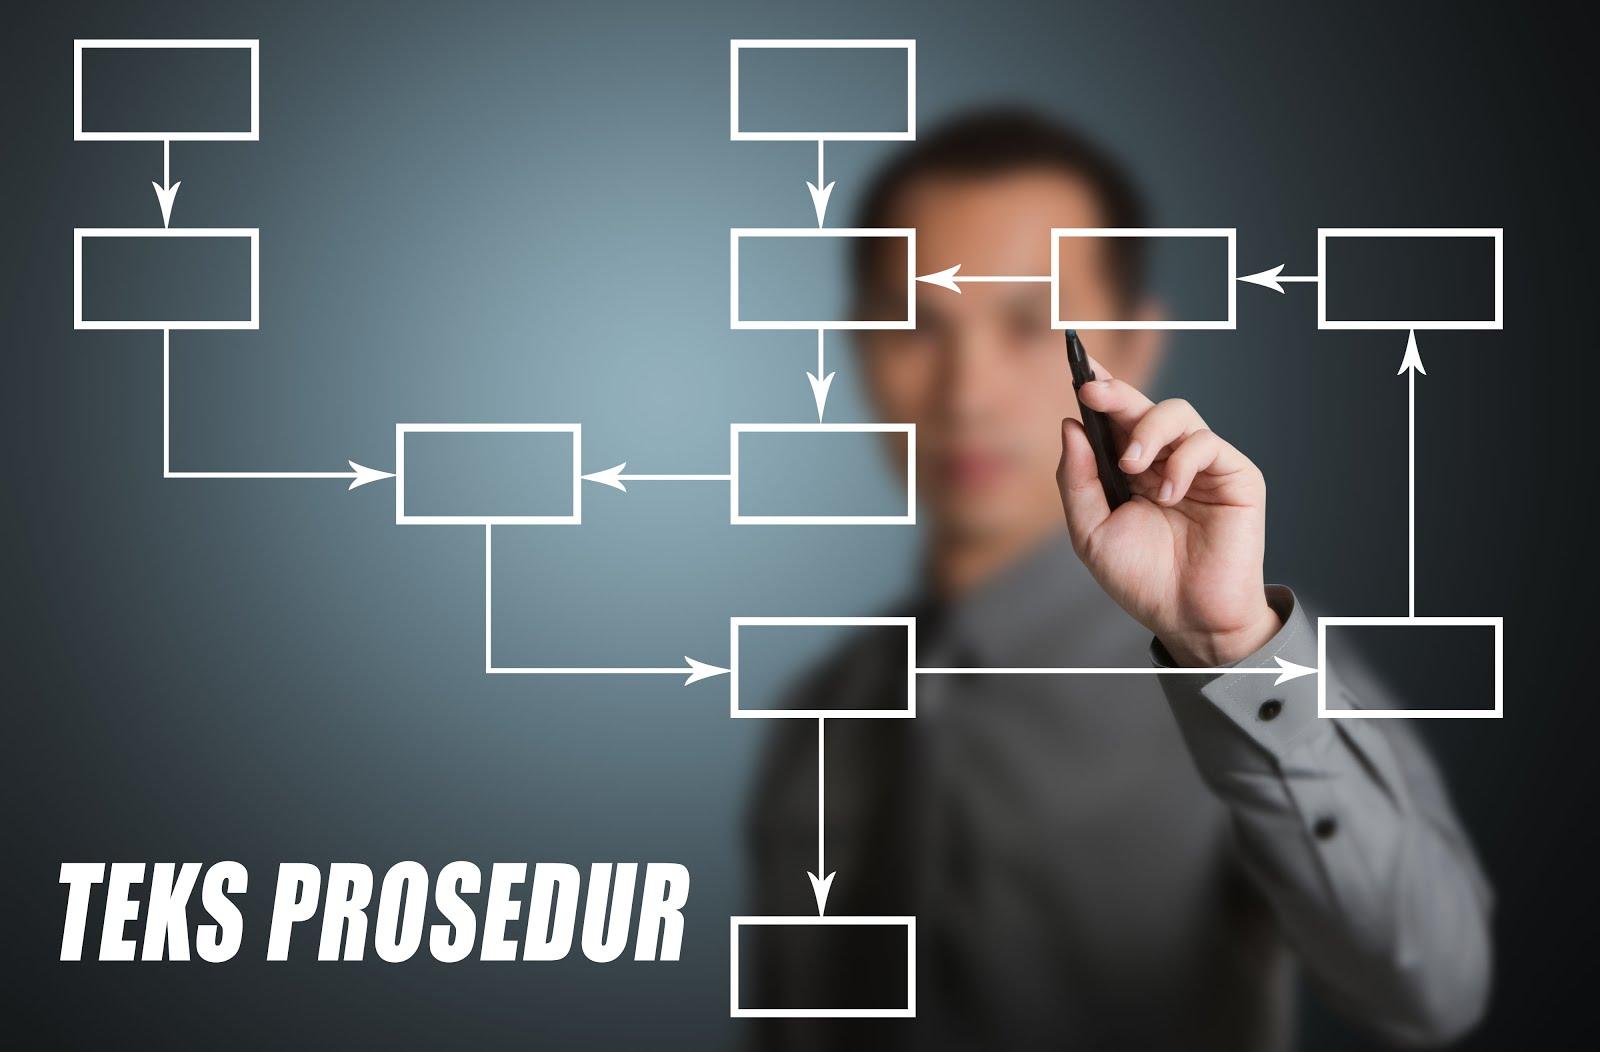 5 Contoh Teks Prosedur Kompleks Sederhana Protokol Beserta